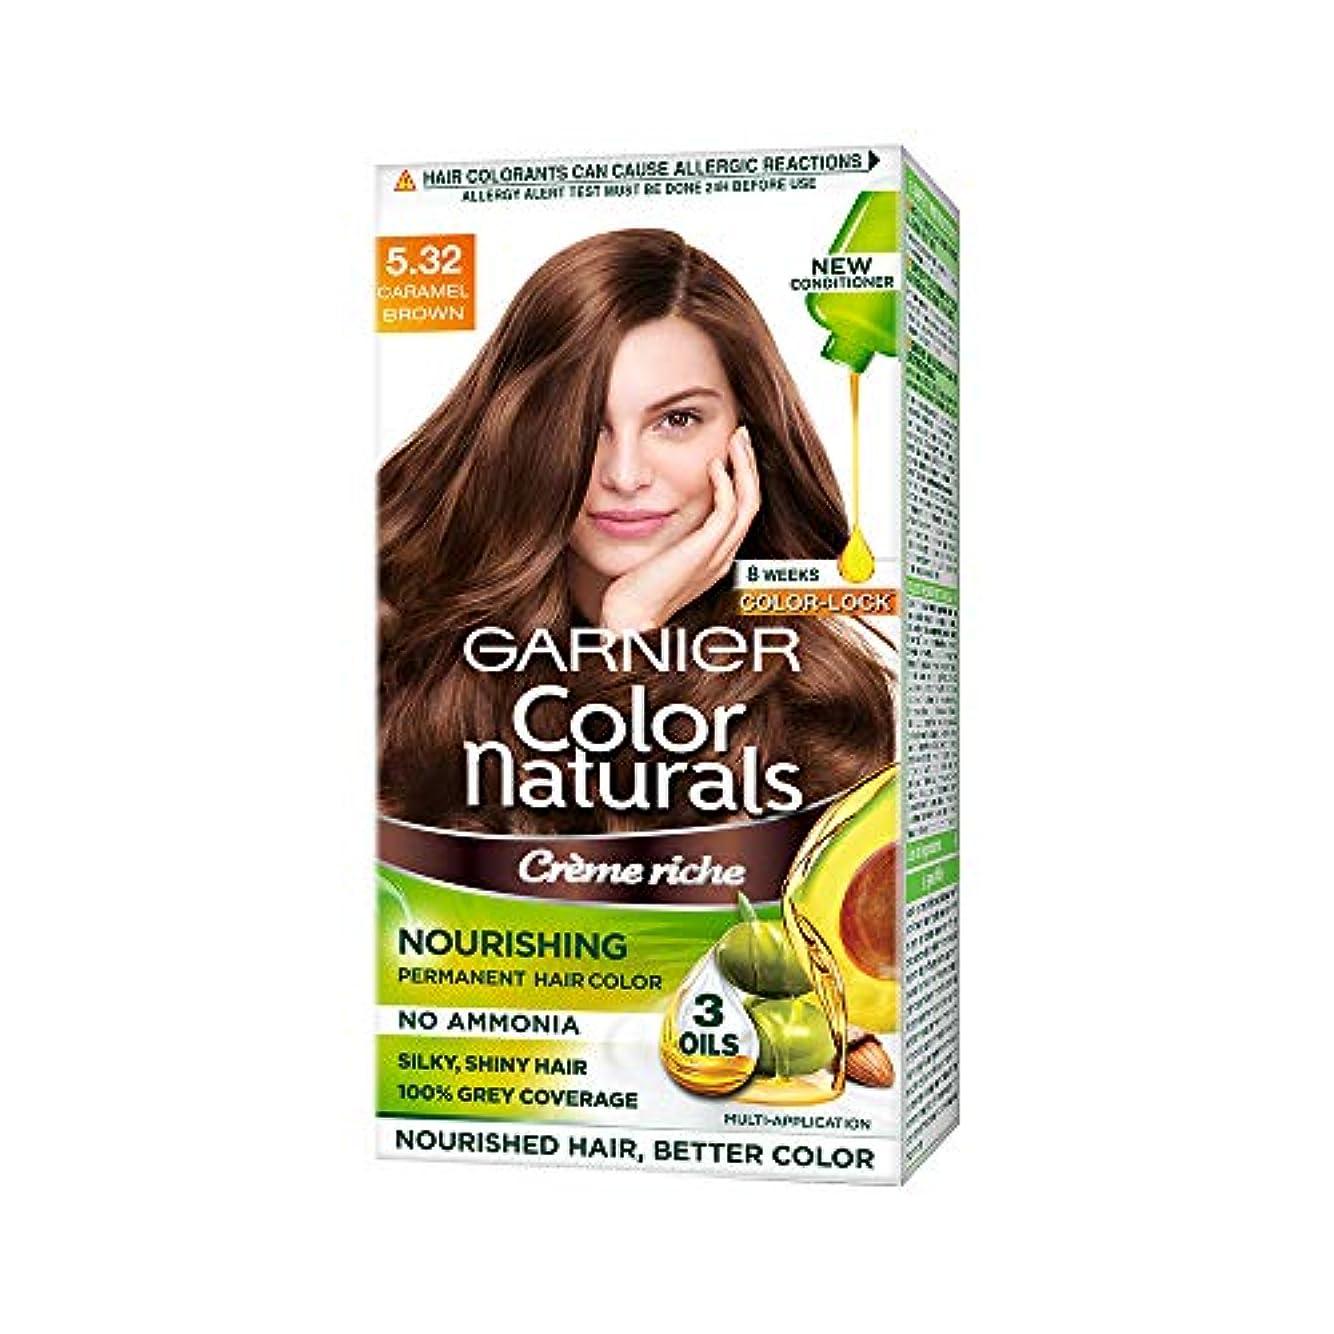 Garnier Color Naturals, Shade 5.32, Caramel Brown 70ml+60g